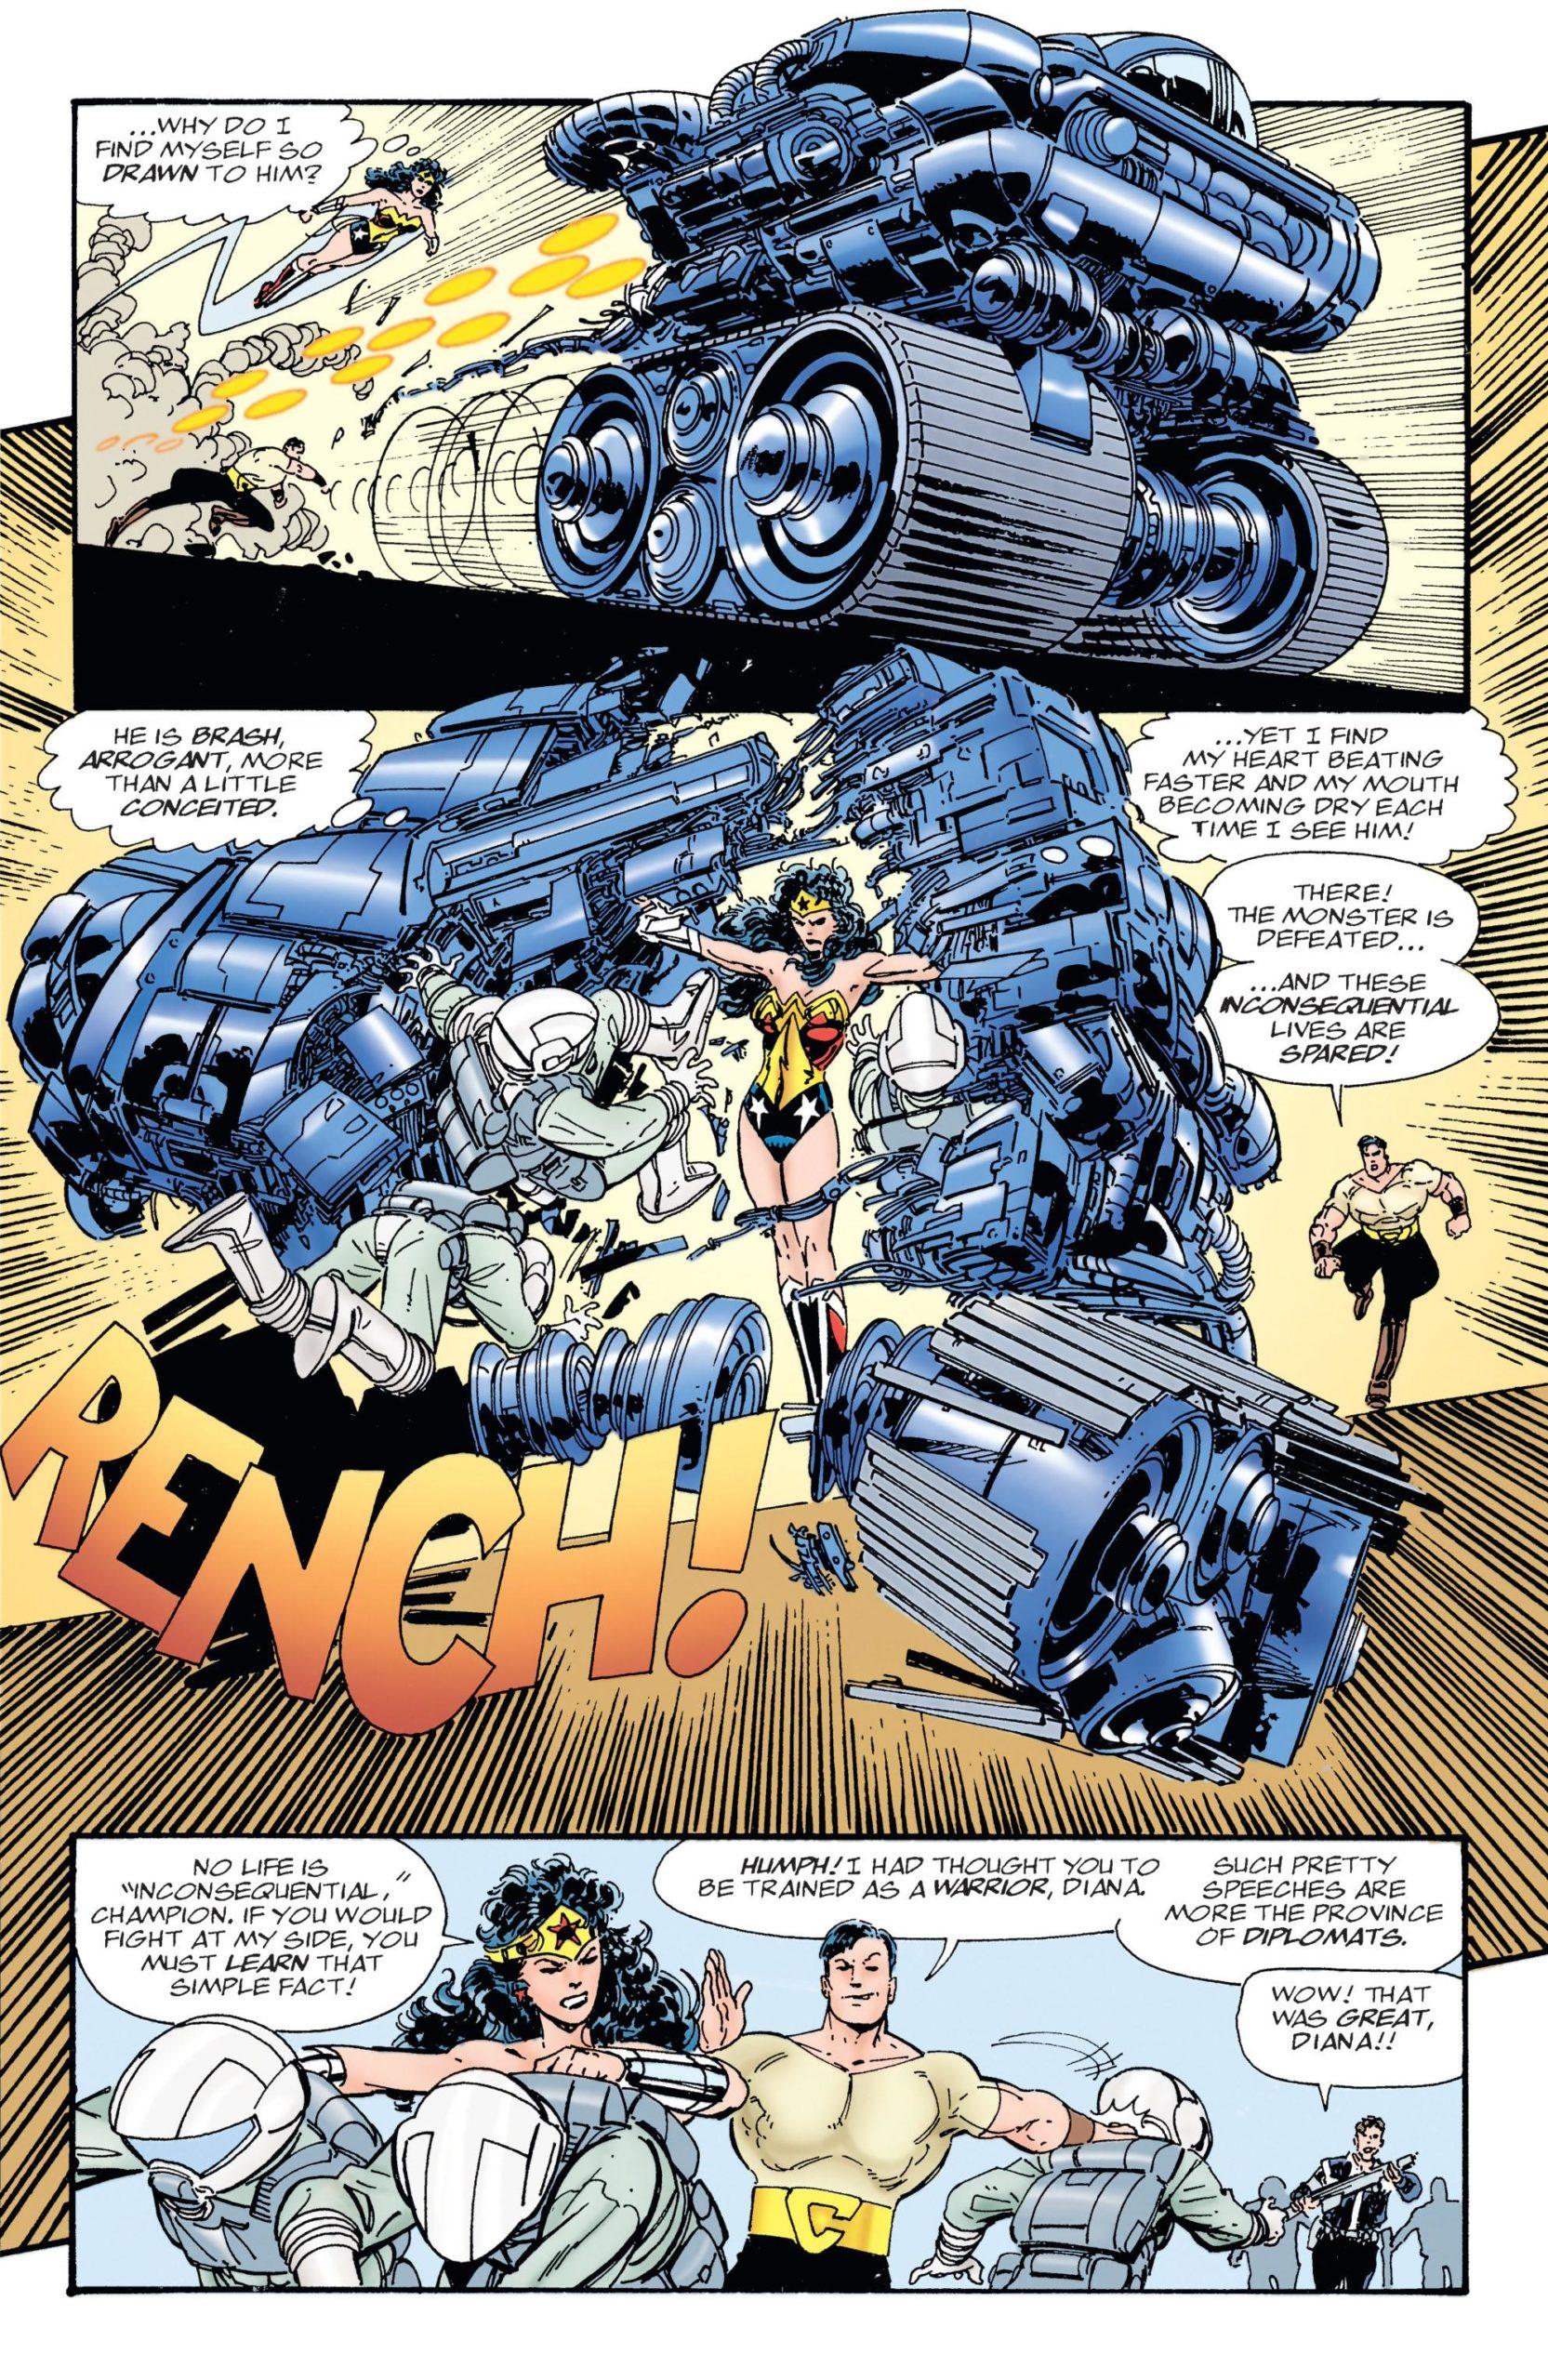 Wonder Woman by John Byrne Book 2 review